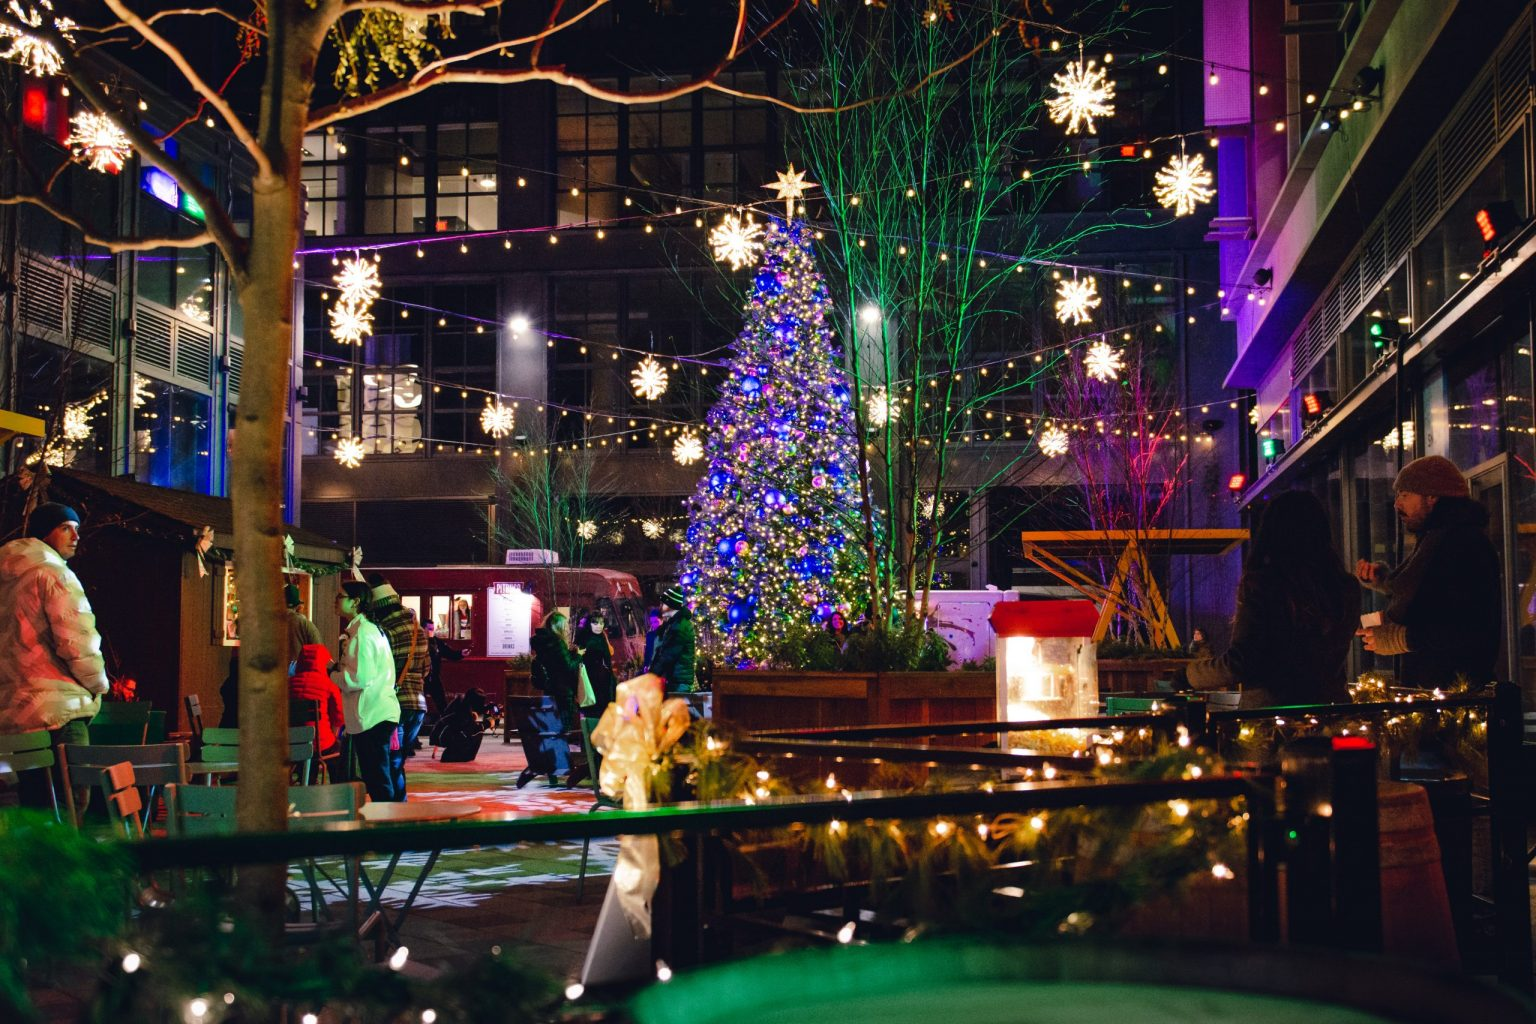 East Market Christmas SnowWalk